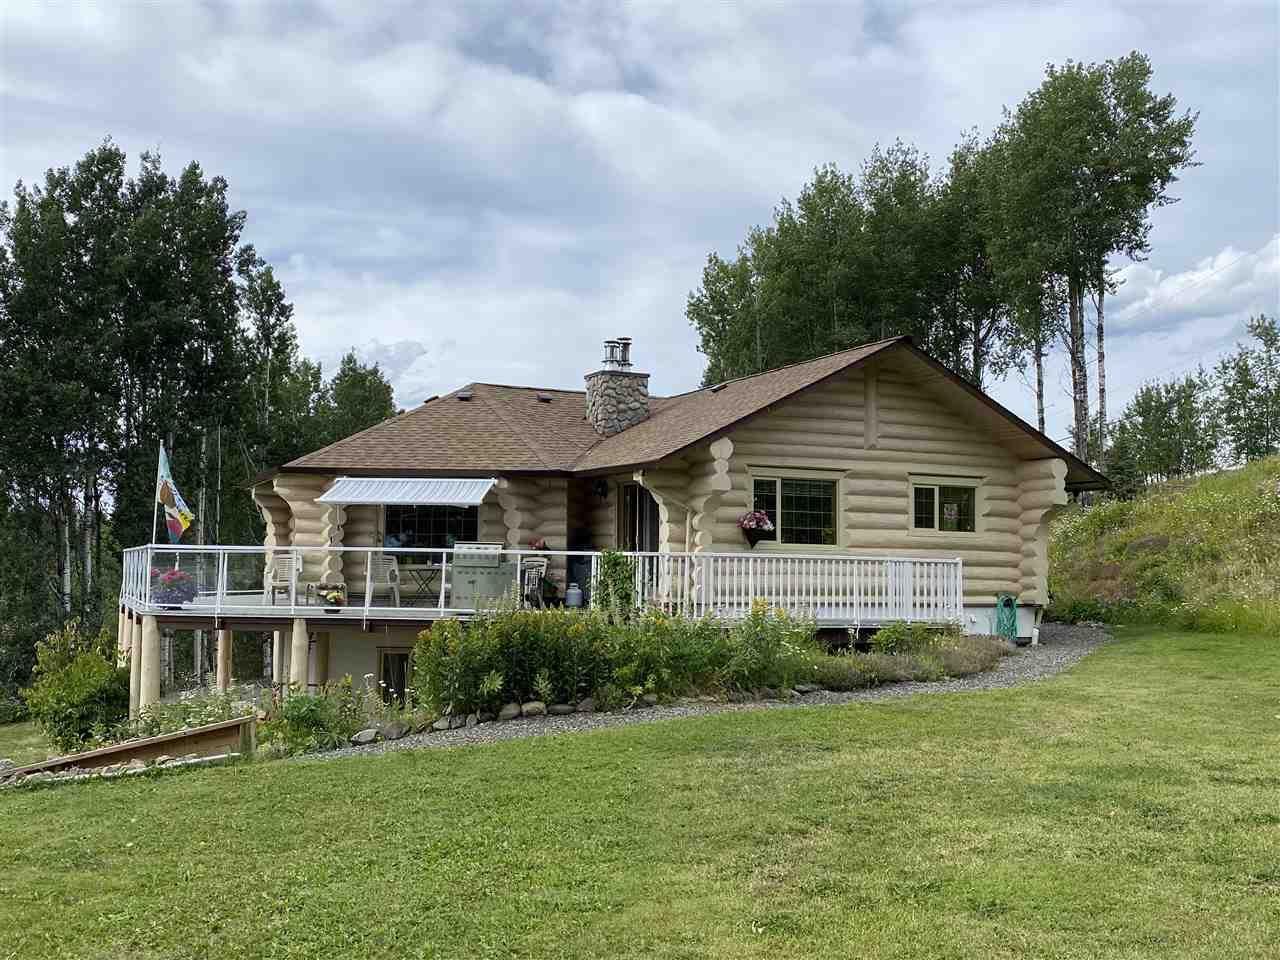 Main Photo: 7947 VIEWLAND Road in Bridge Lake: Bridge Lake/Sheridan Lake House for sale (100 Mile House (Zone 10))  : MLS®# R2537222